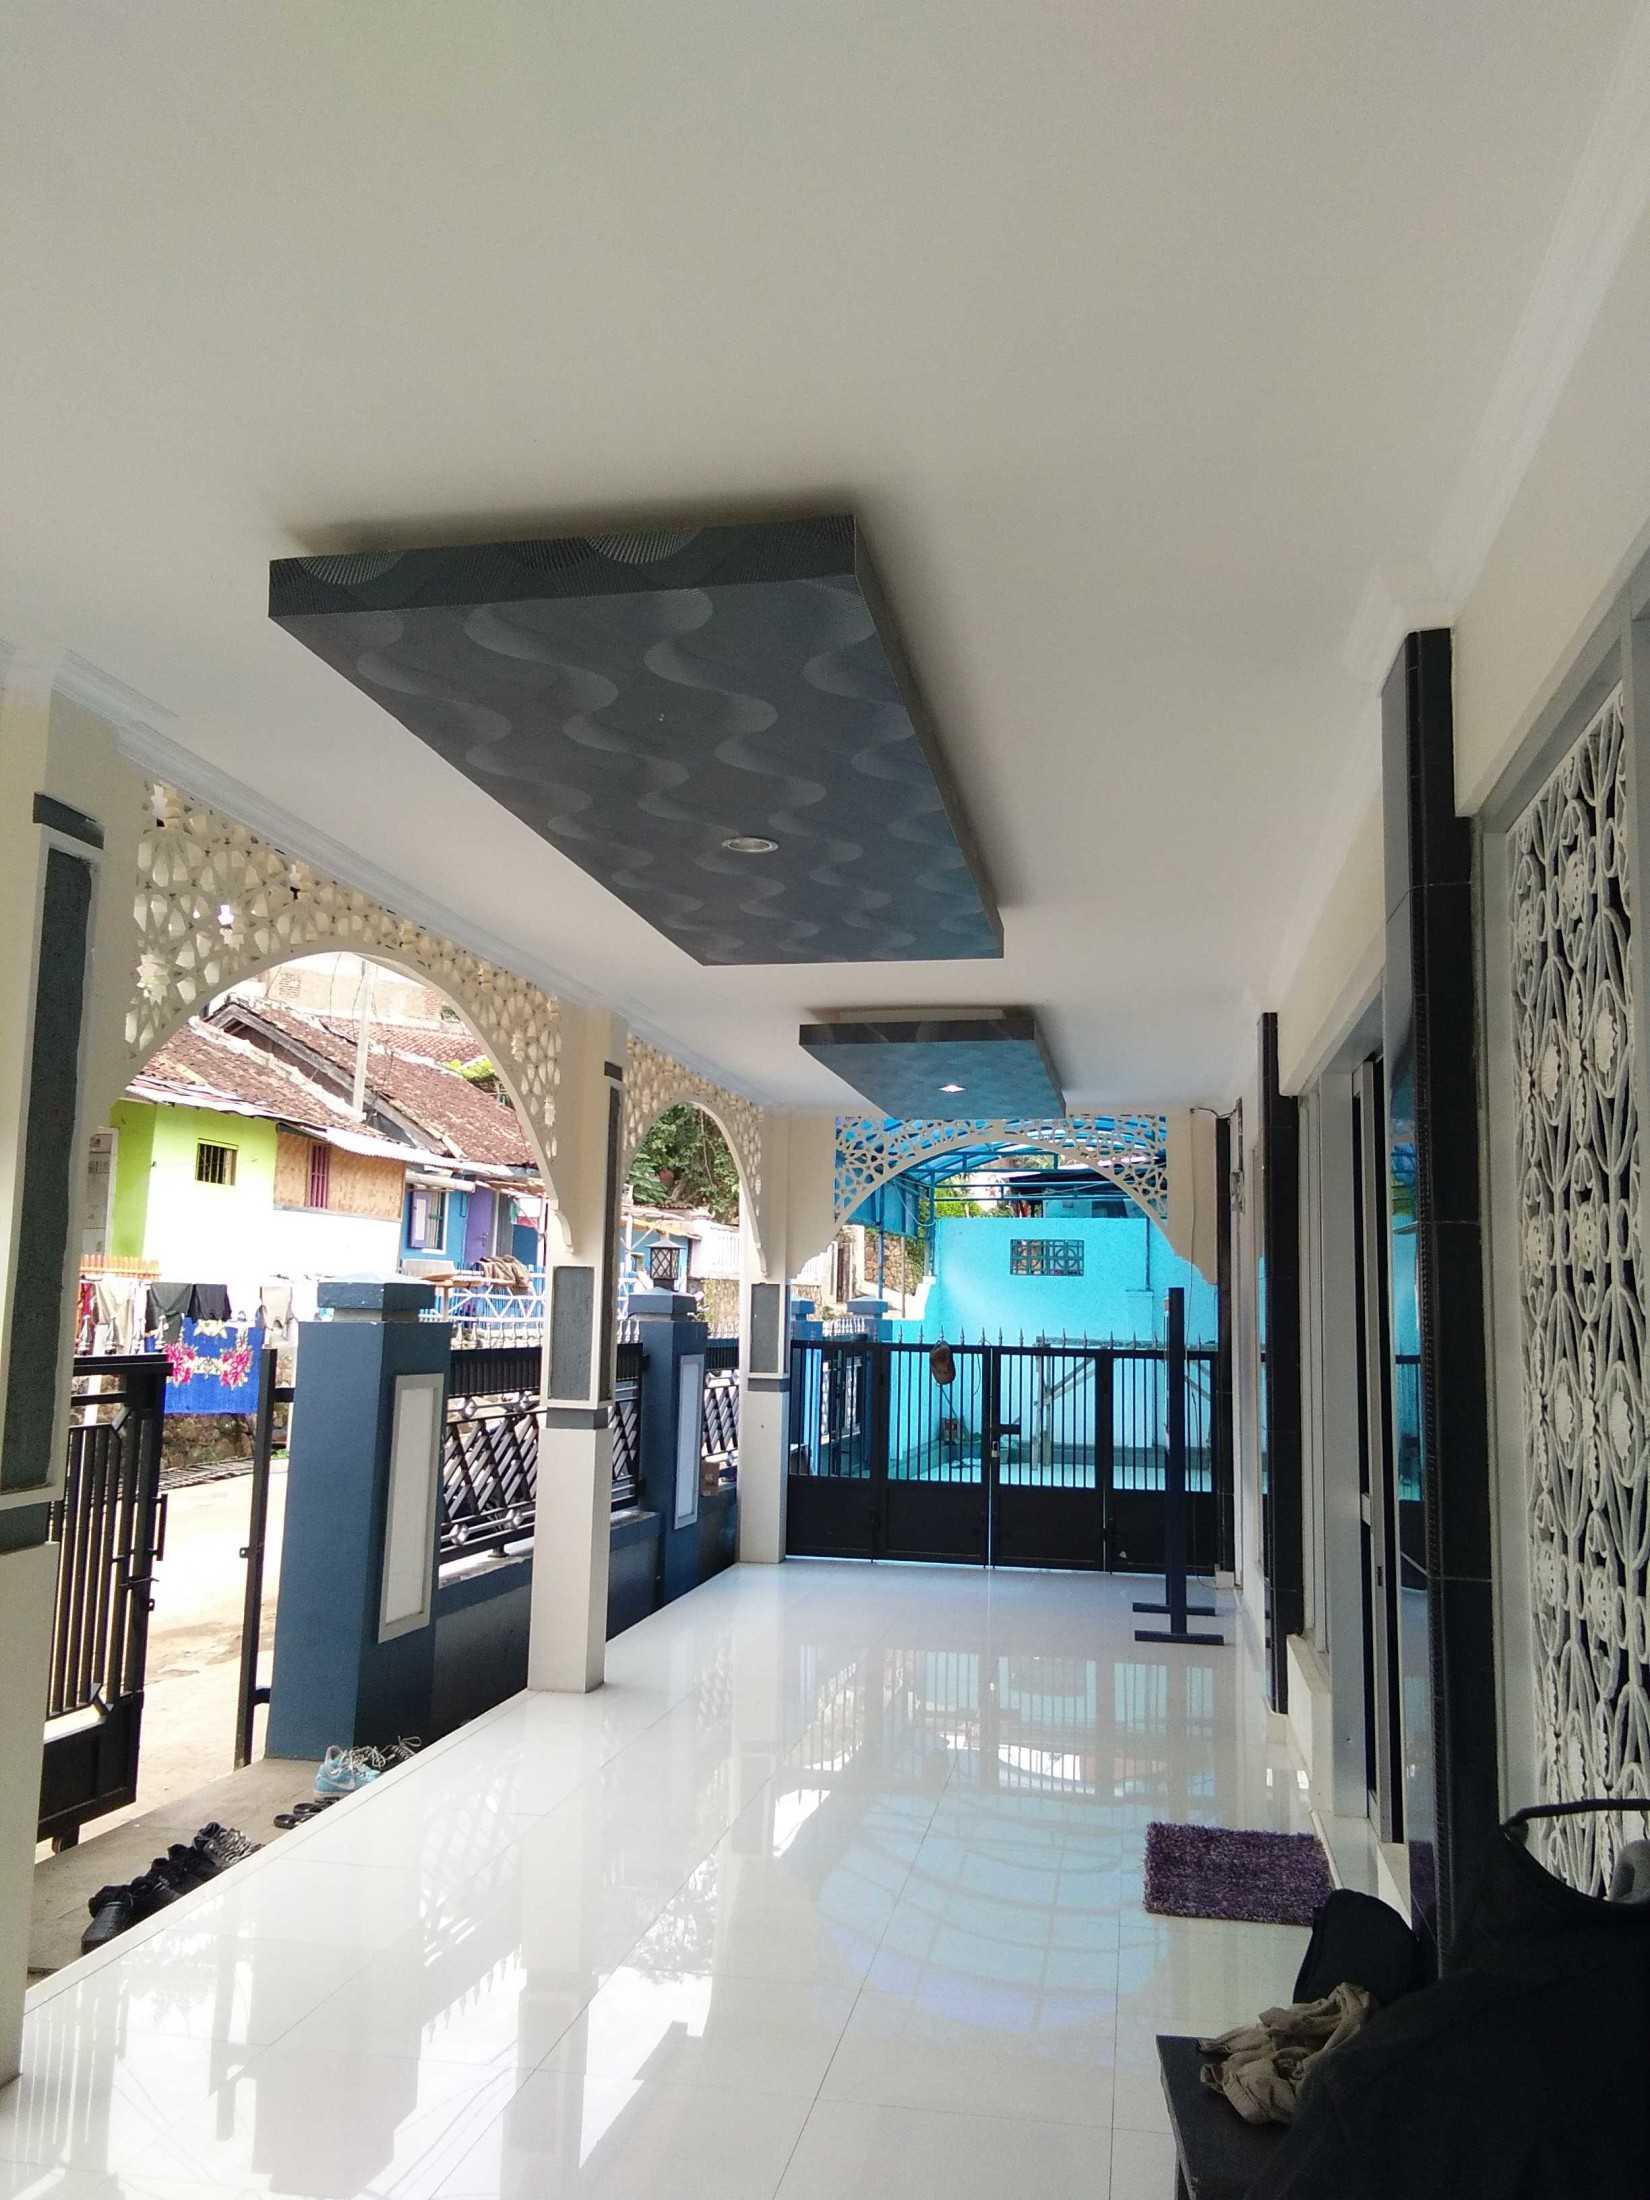 Archdesignbuild7 Mesjid Nasrullah  Soreang, West Java Soreang, West Java Andiyanto-Purwonost-Mesjid-Nasrullah-  57341